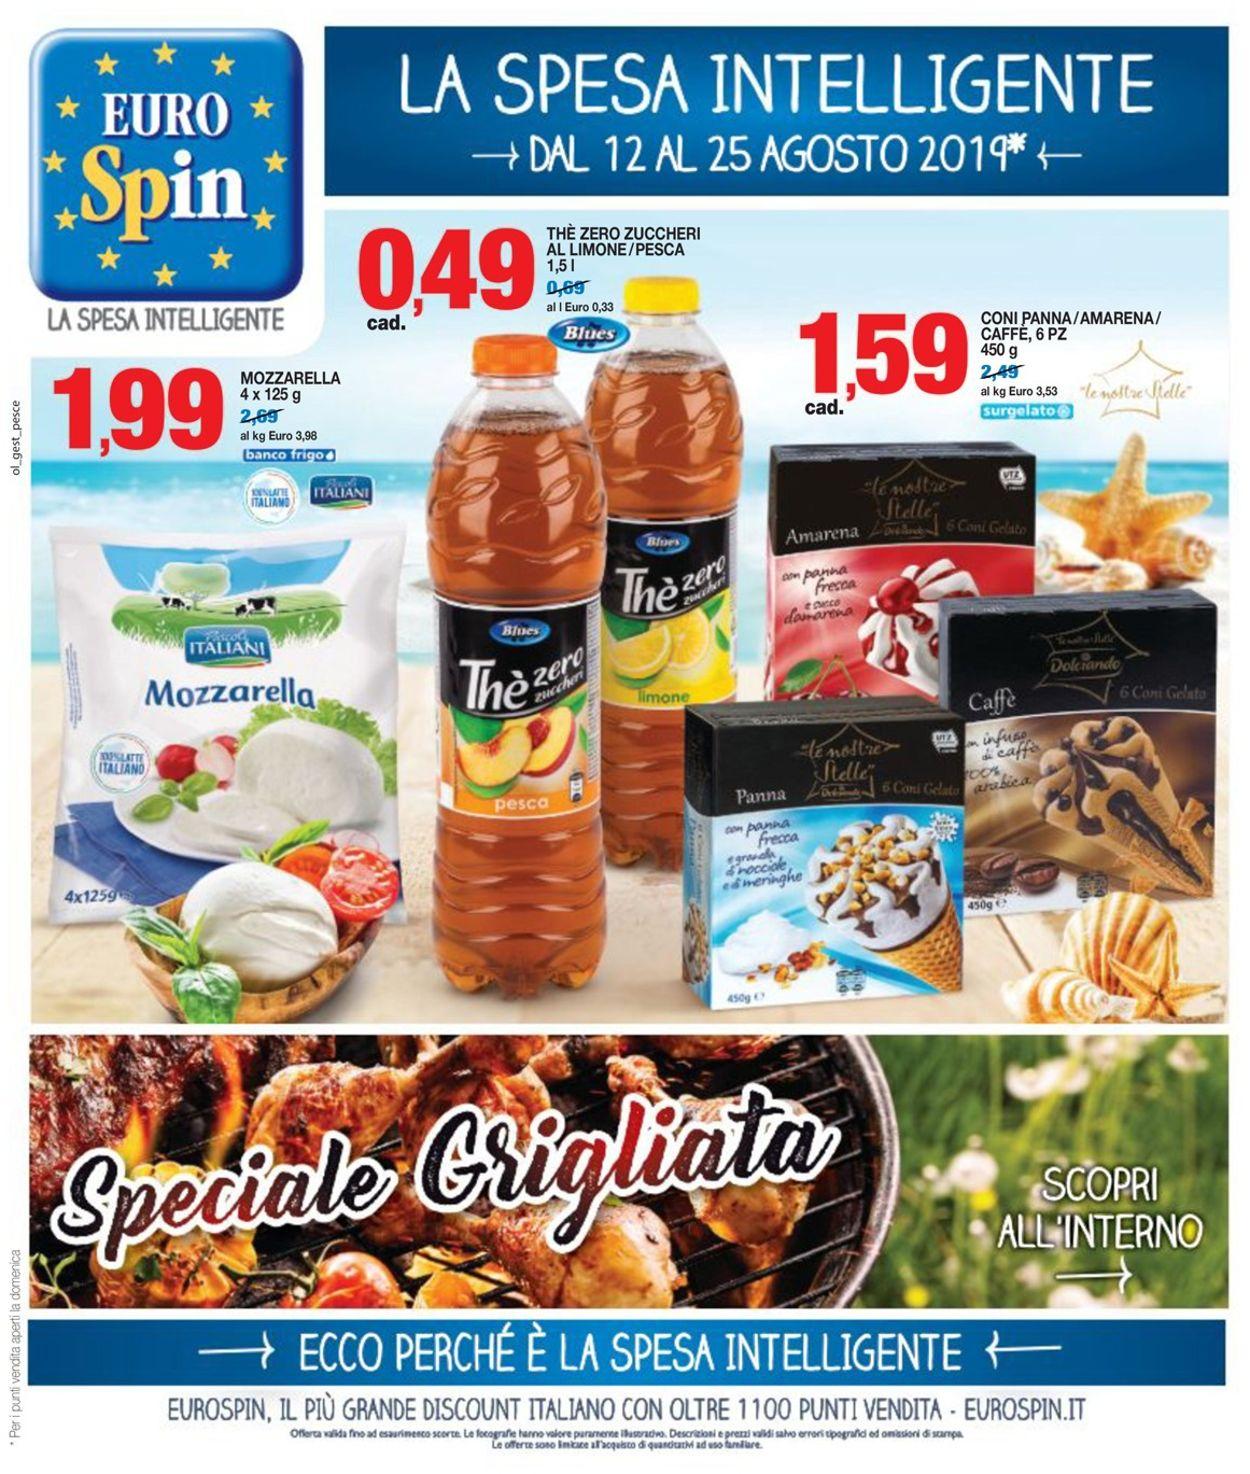 Volantino EURO Spin - Offerte 12/08-25/08/2019